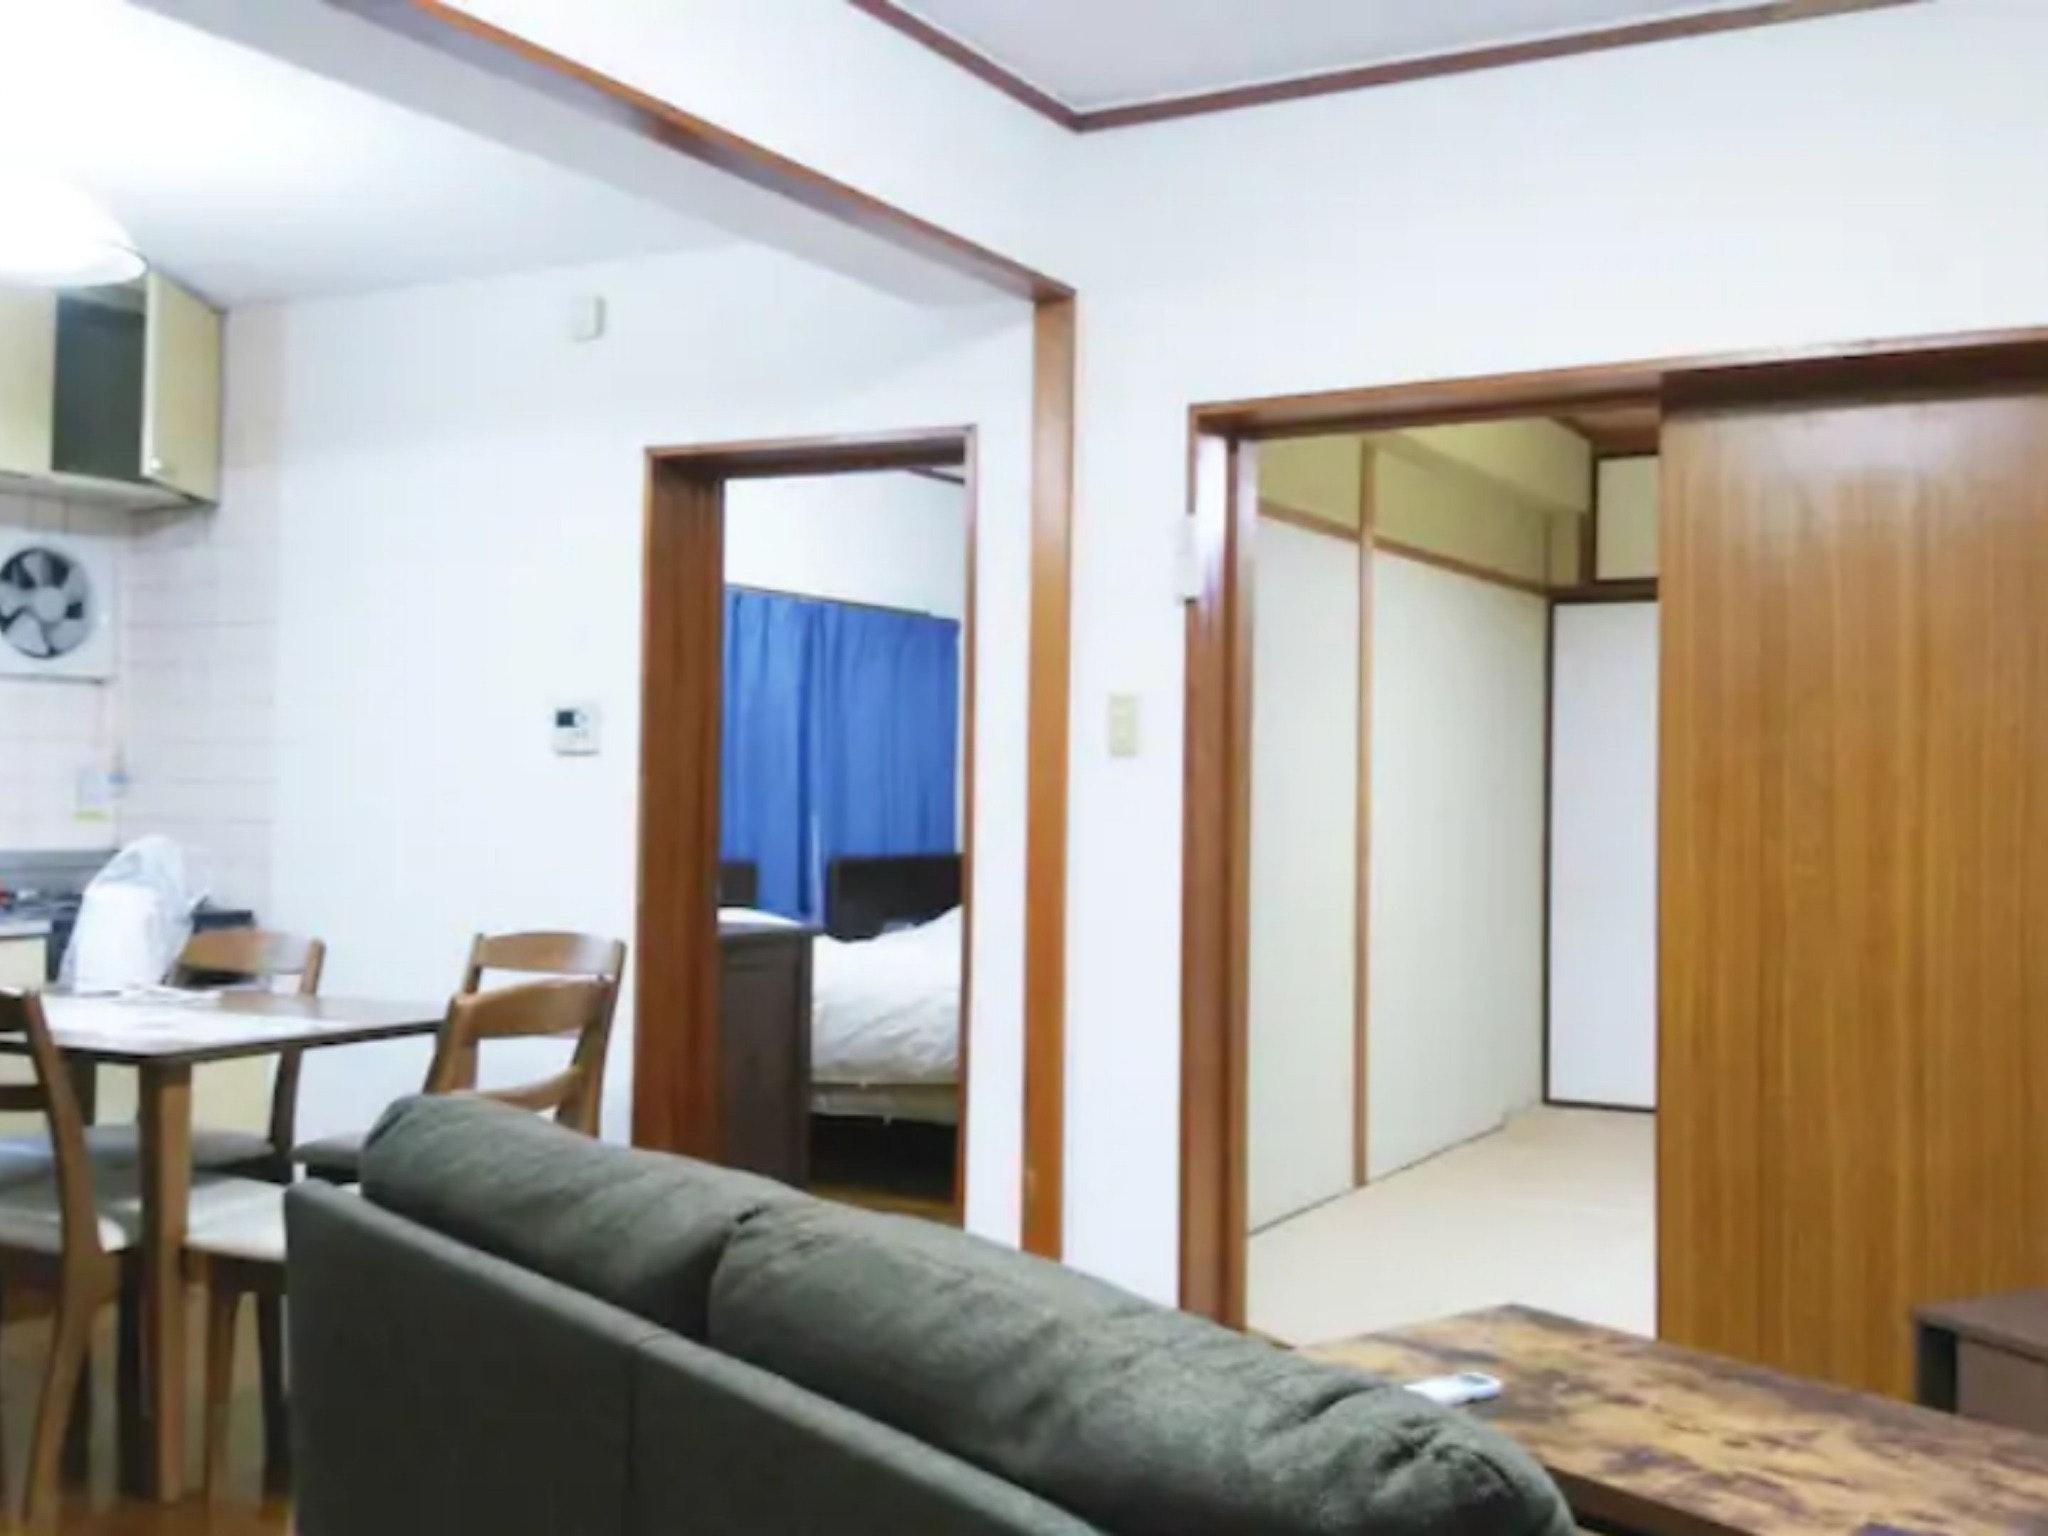 和洋室&LDK(52m2)5名宿泊可能 最寄駅から徒歩4分☆